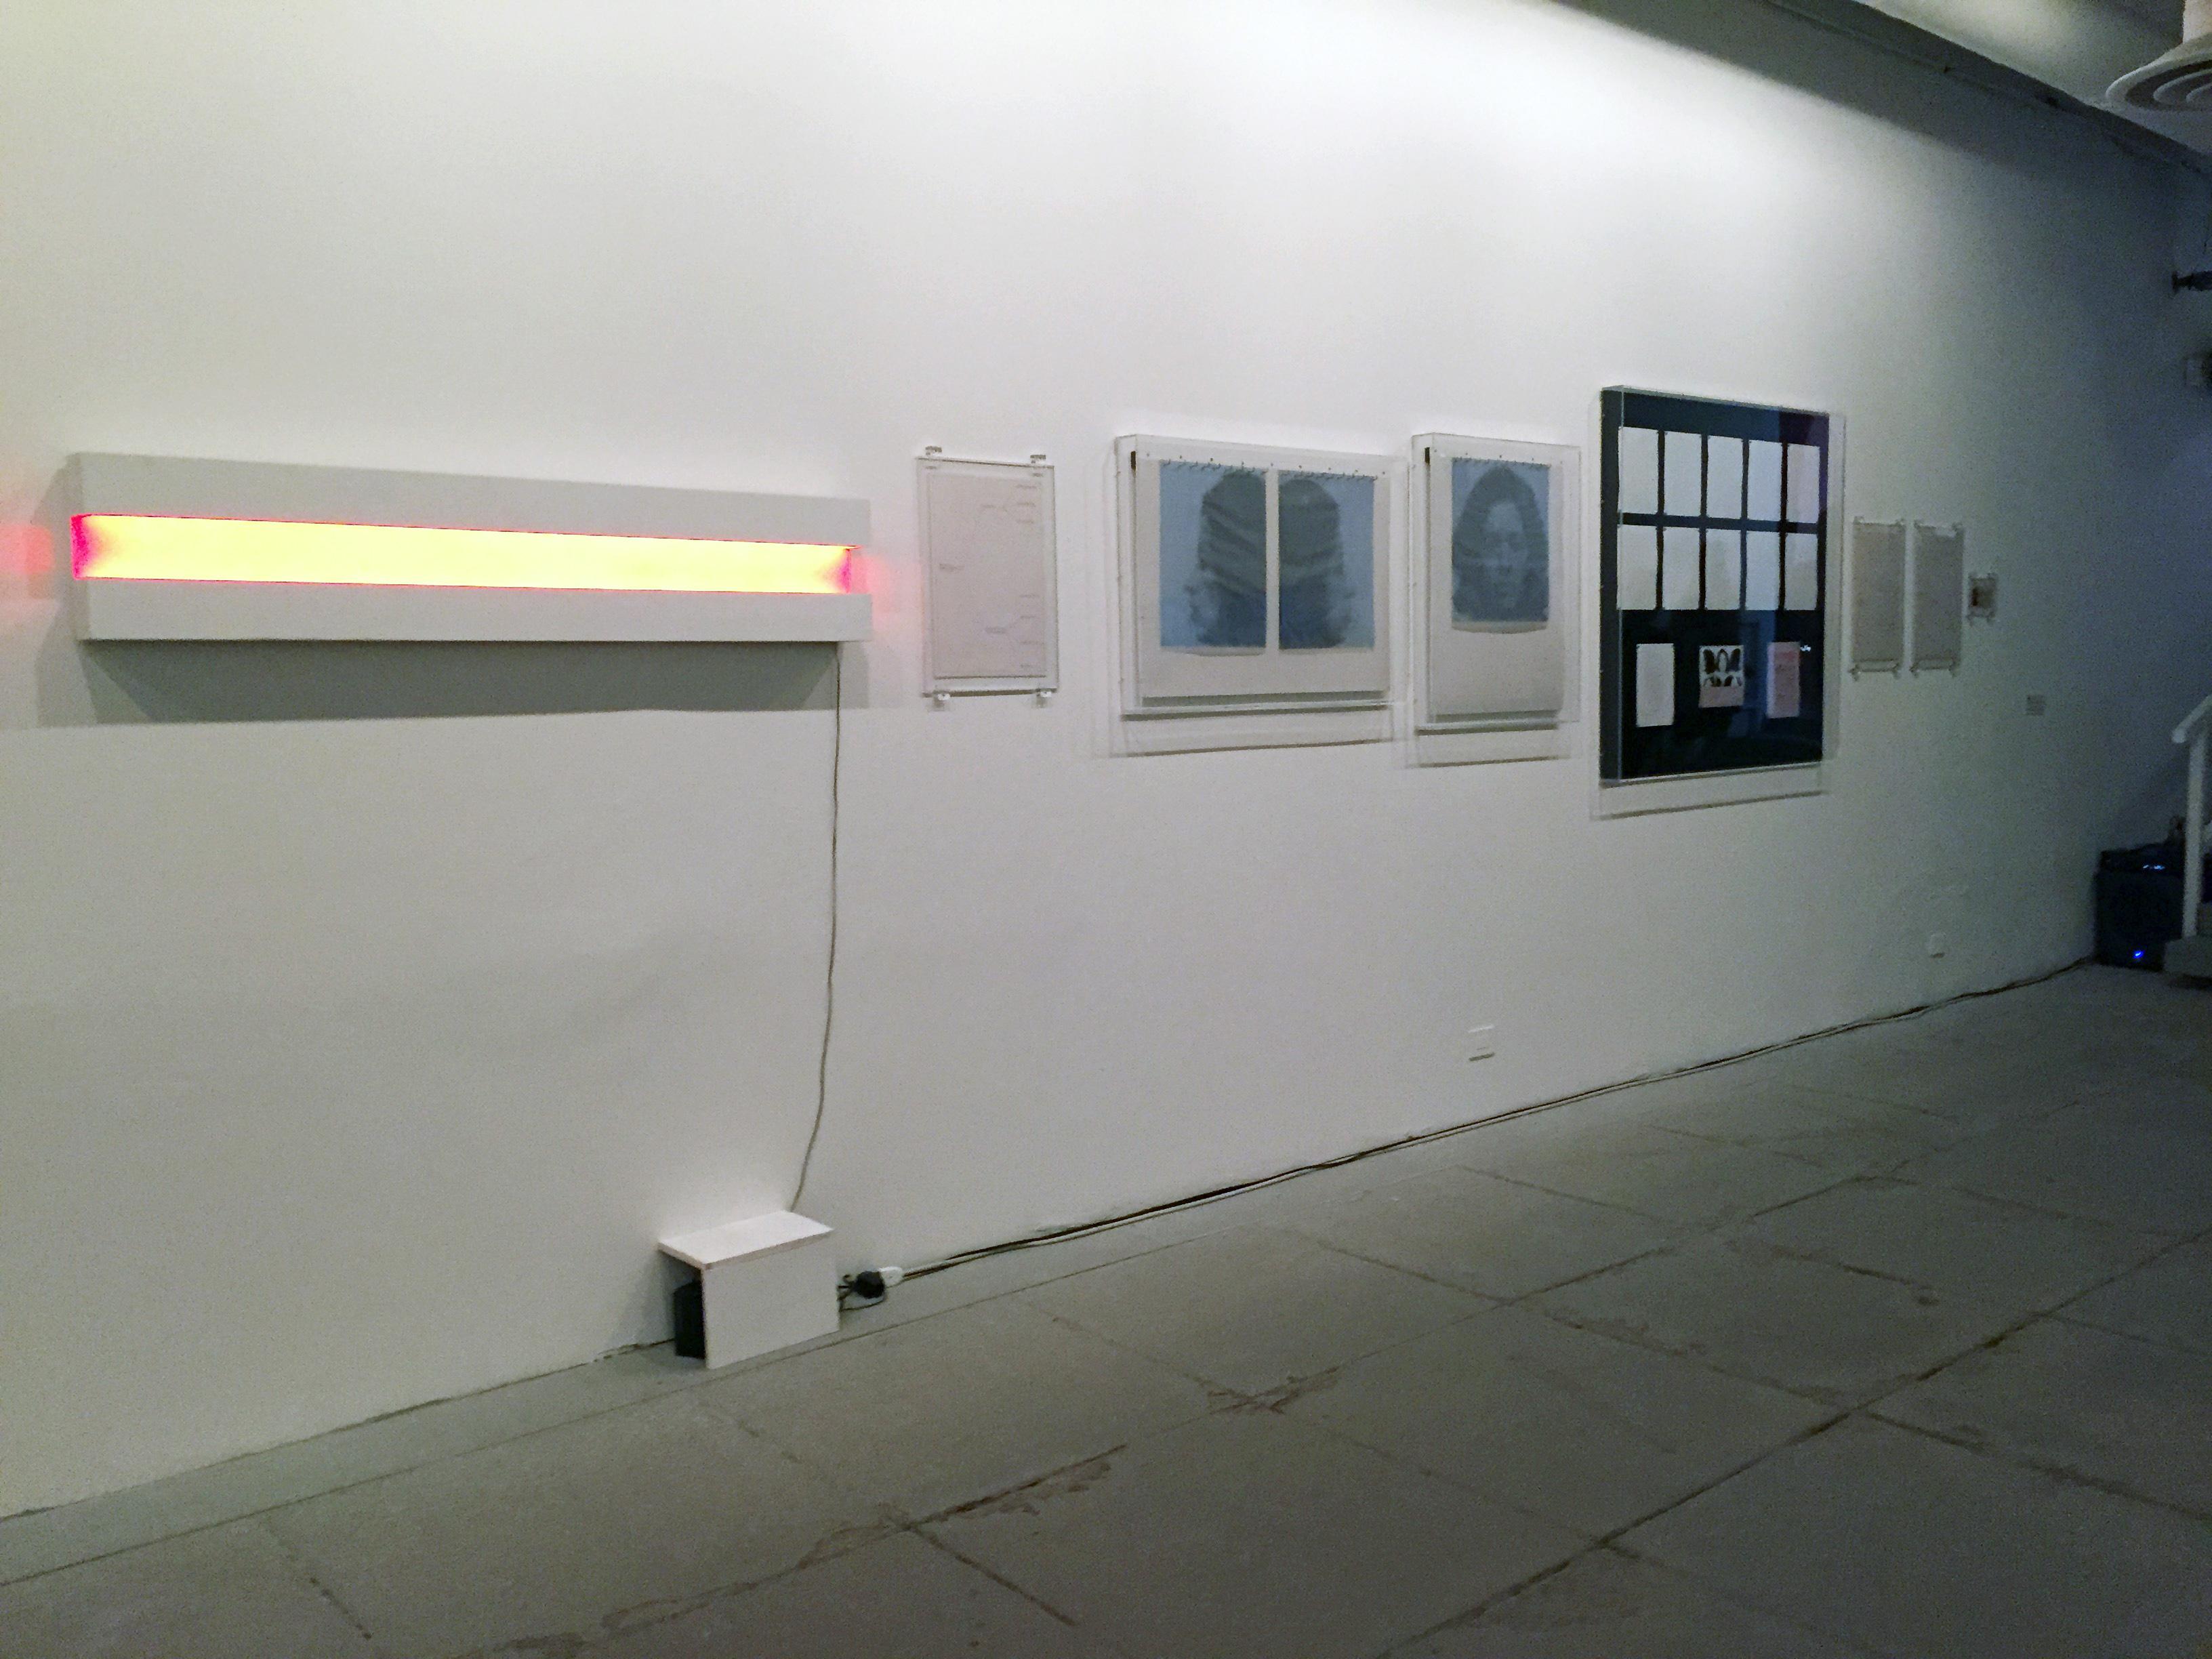 Galerie Barbara Thumm \ Teresa Burga – 56th Venice Bienniale